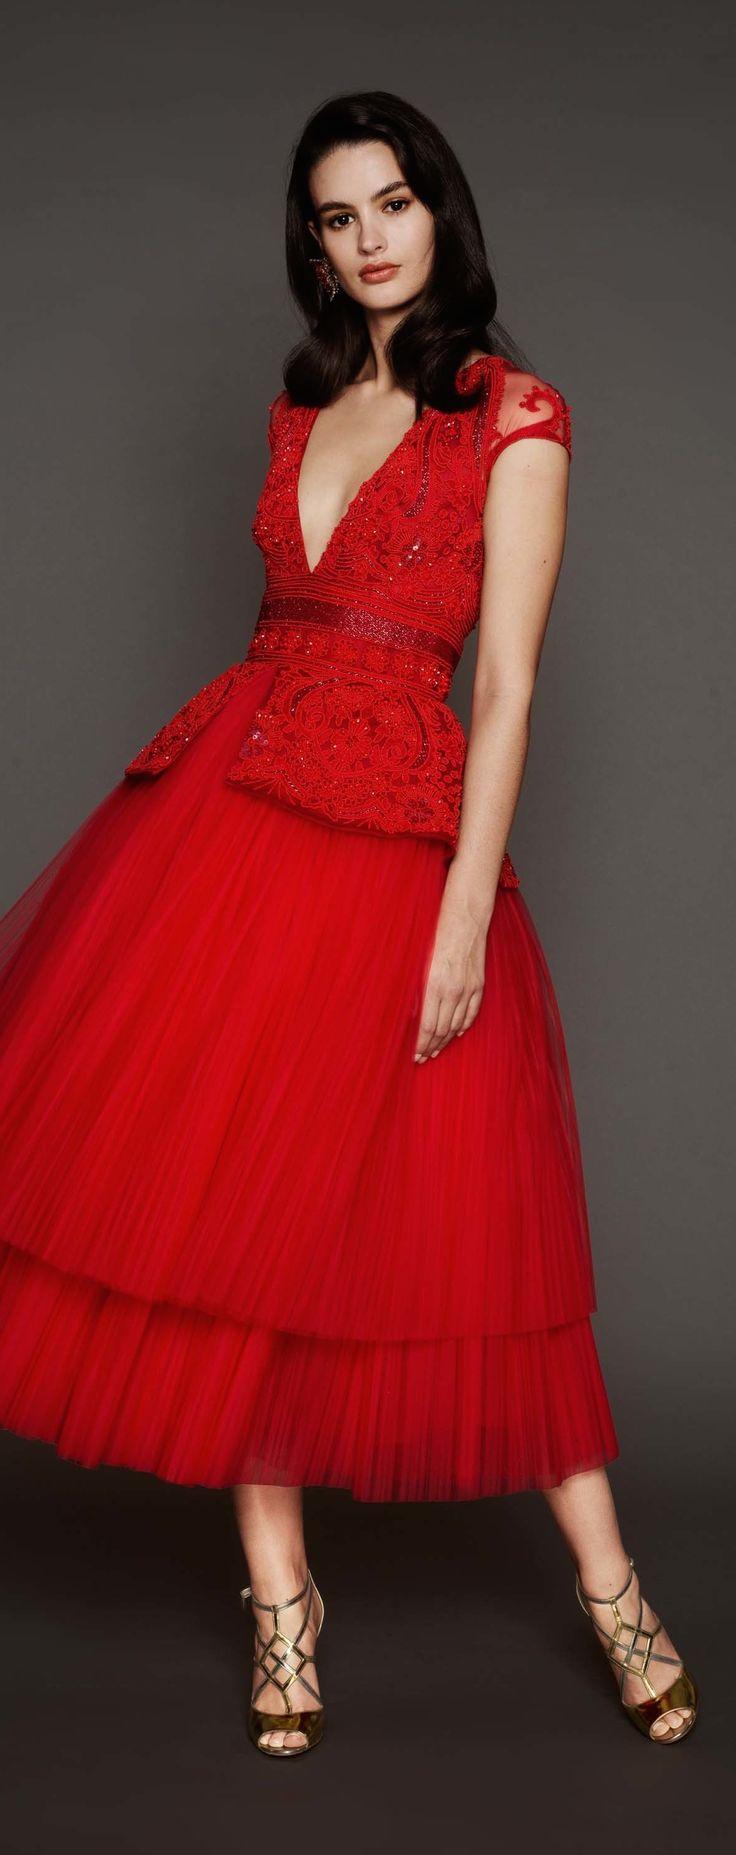 best fashion images on pinterest fashion women woman clothing